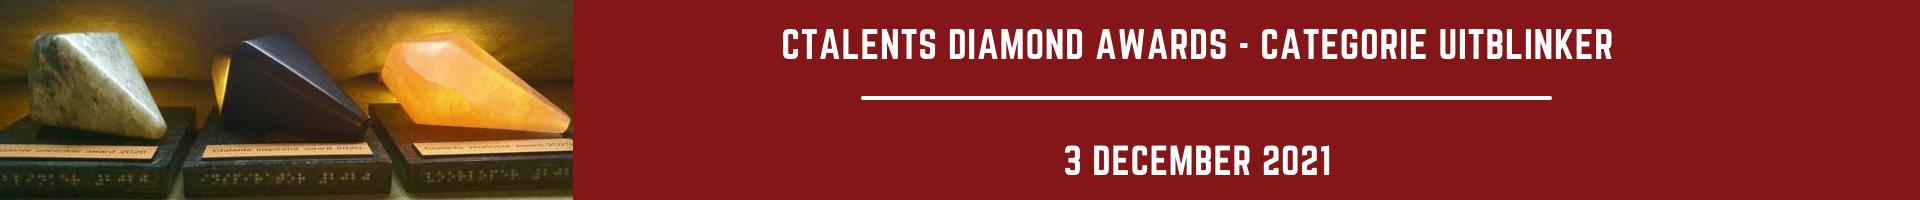 Ctalents Diamond Awards Uitblinker